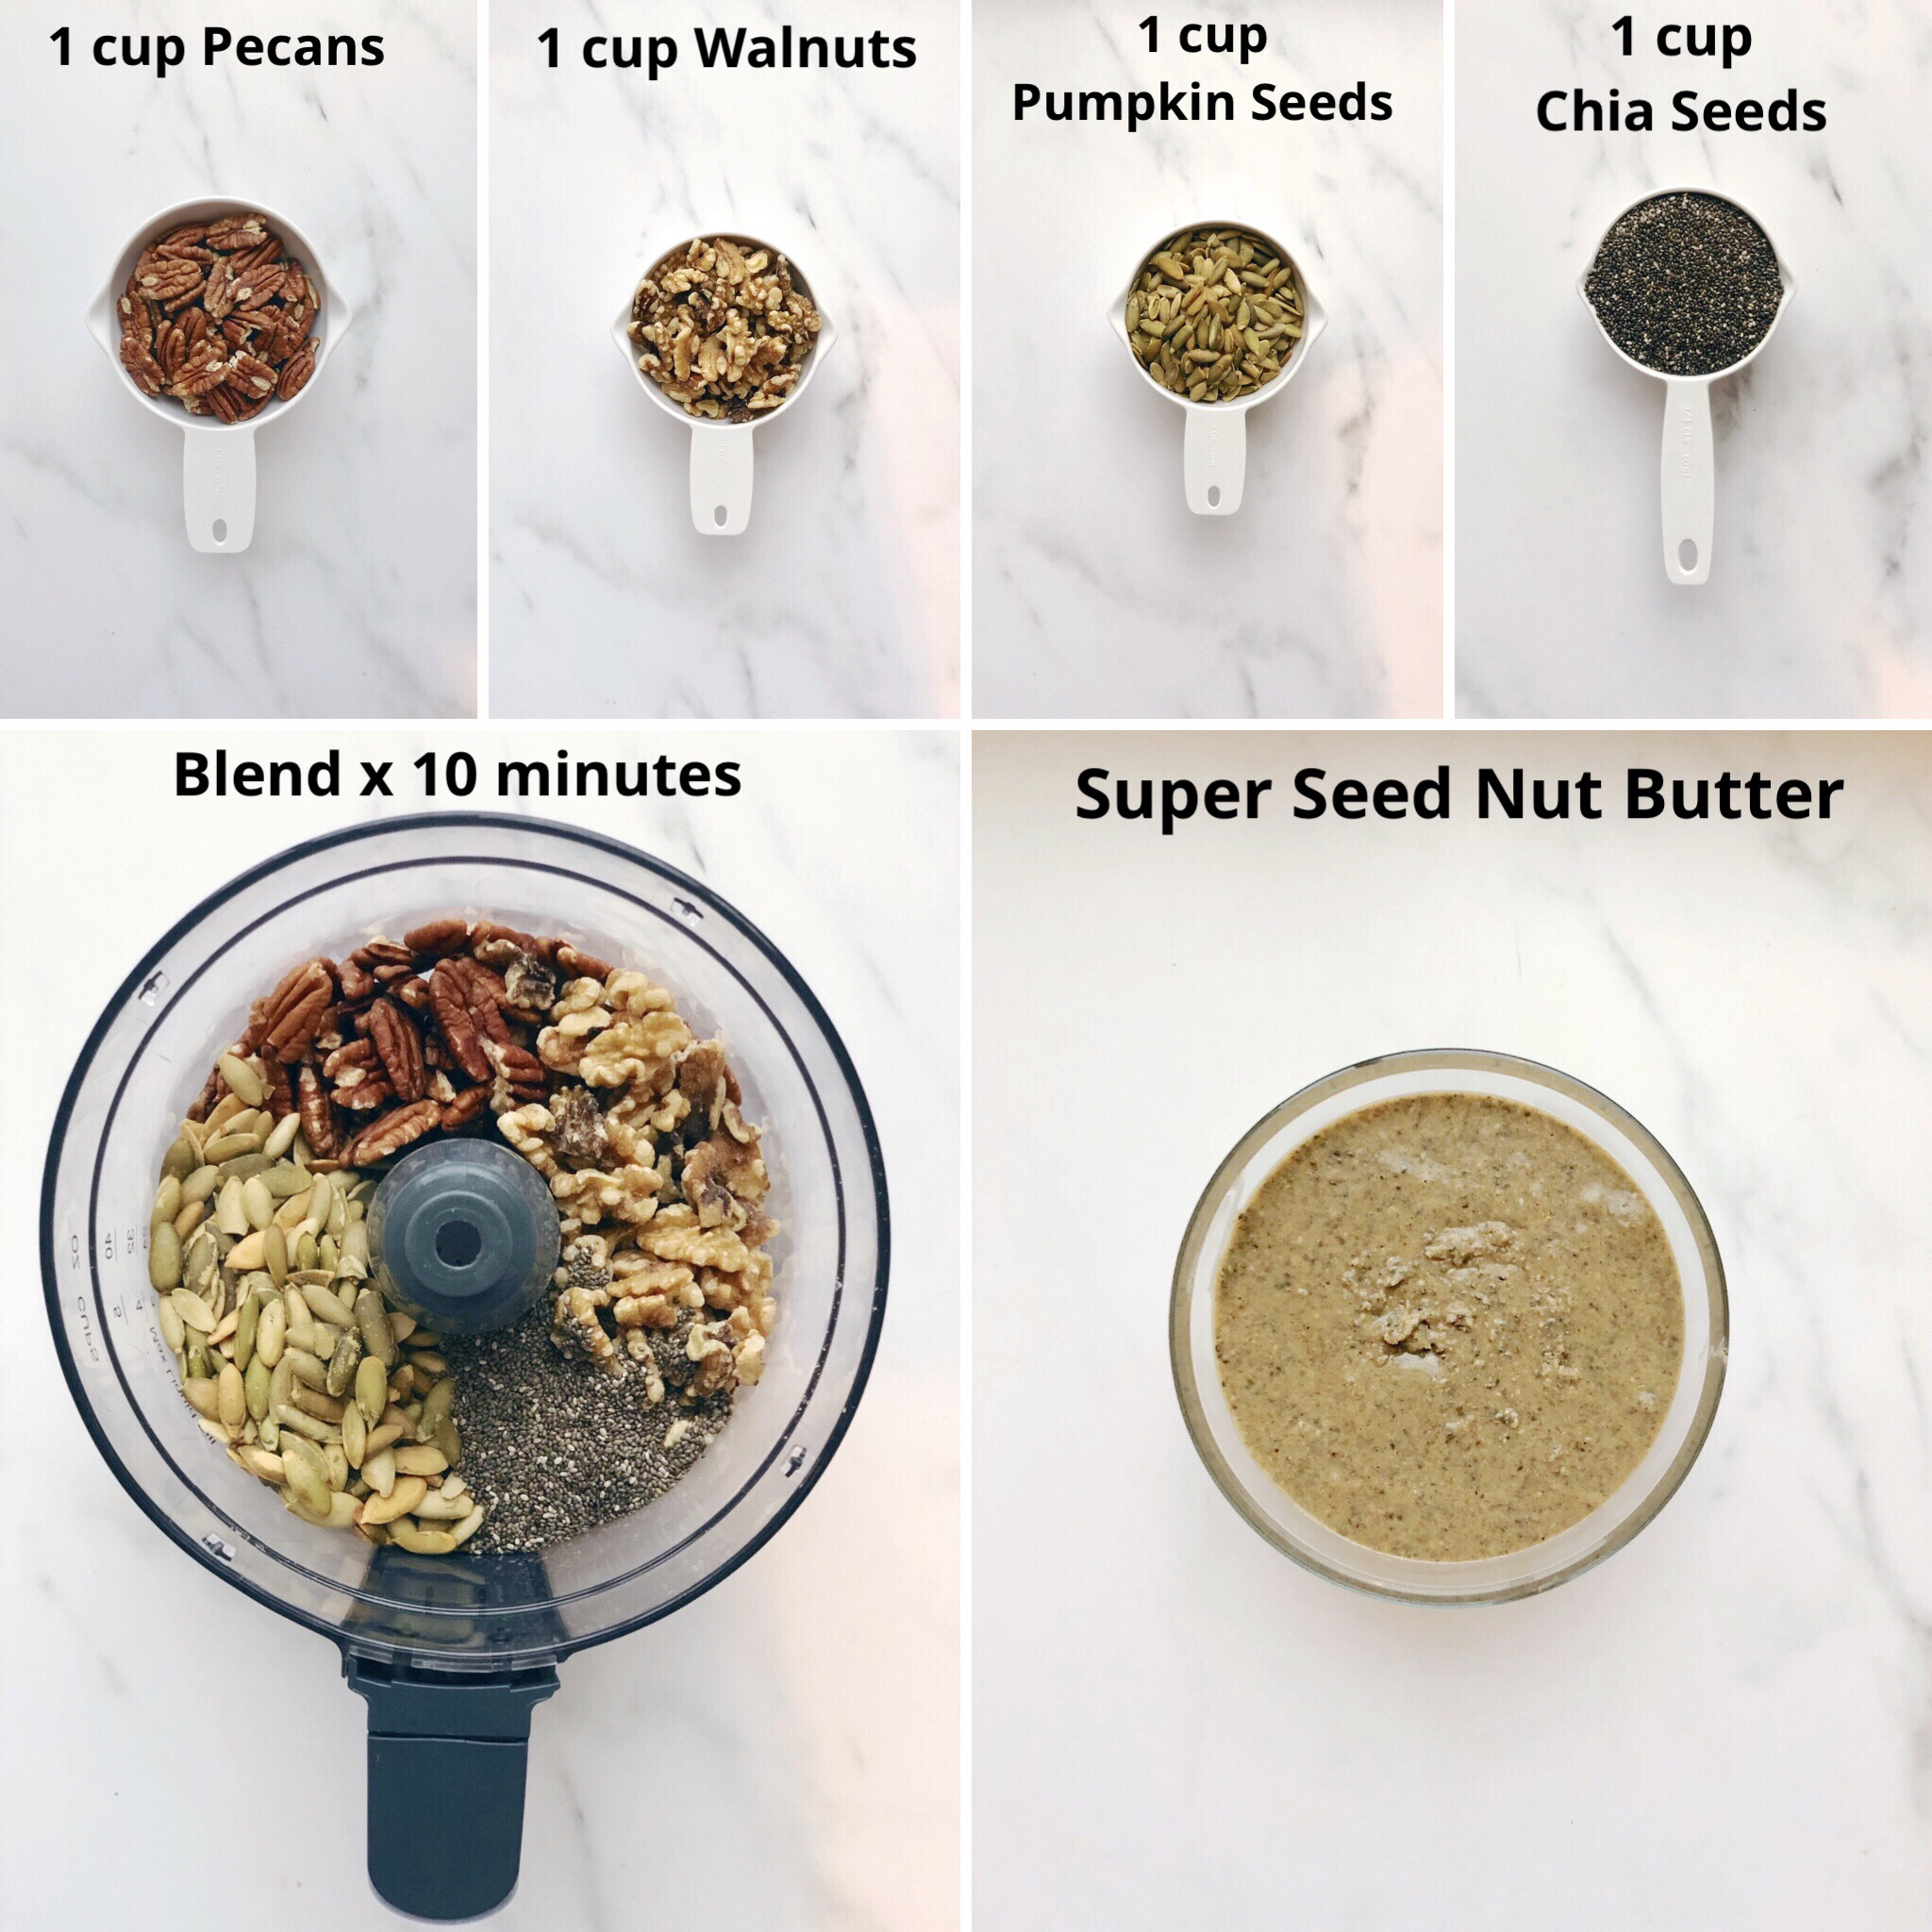 super seed nut butter.jpg